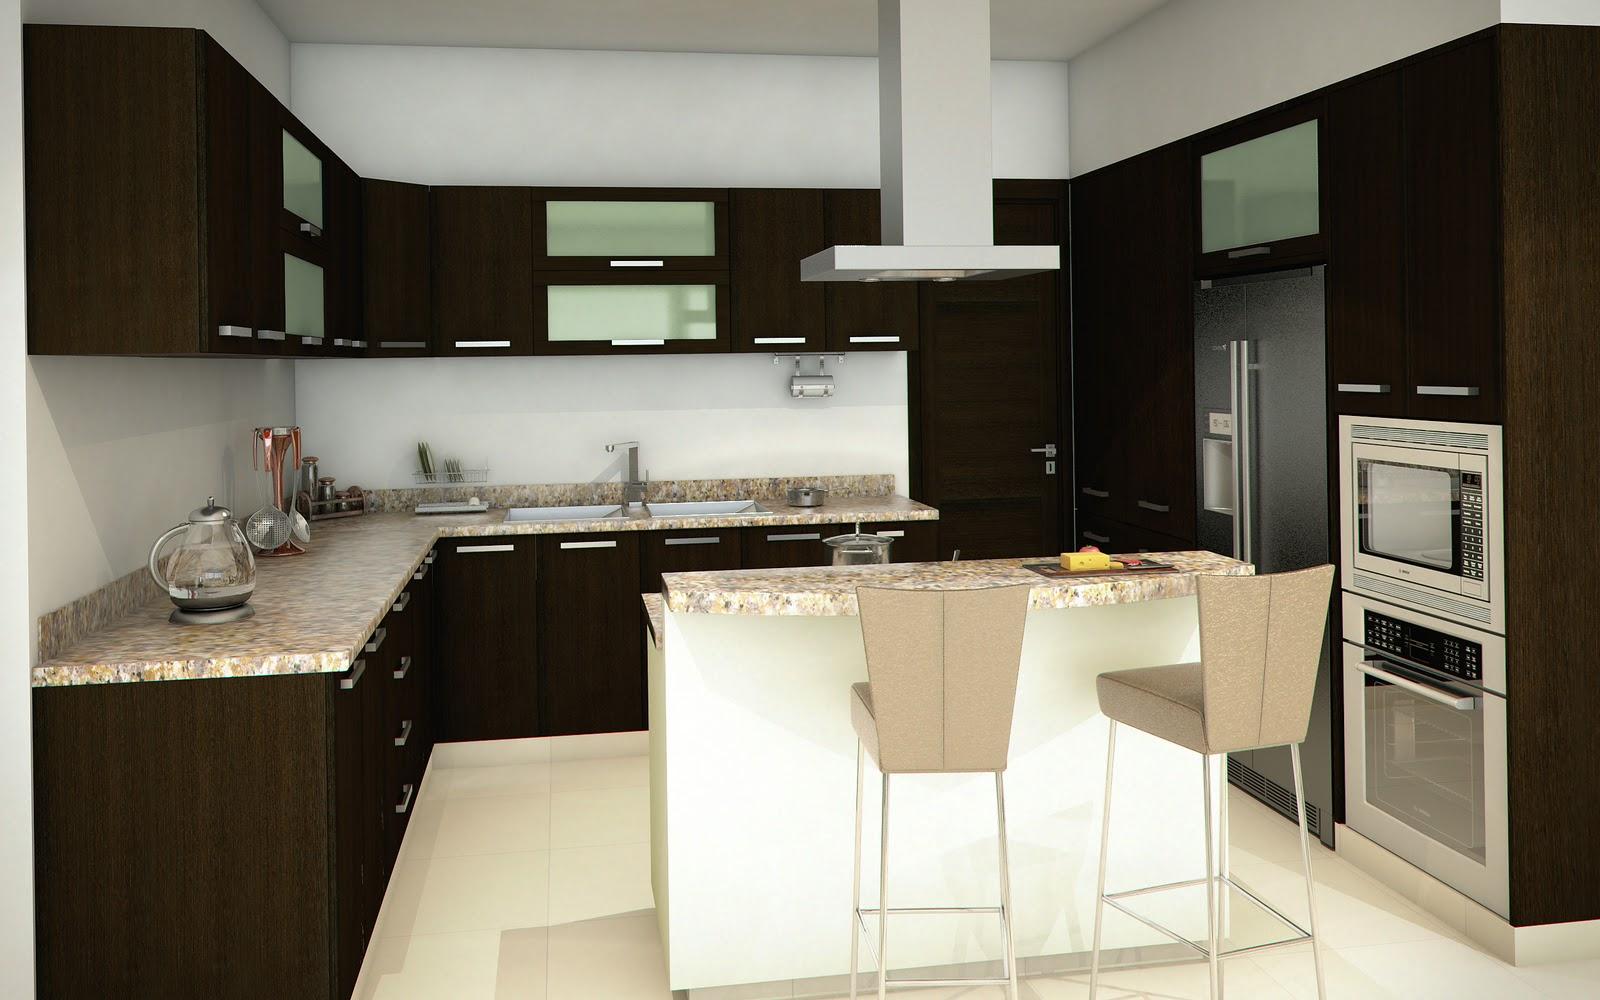 Como decorar mi casa blog de decoracion hermosa dise o - Fotografias de cocinas ...